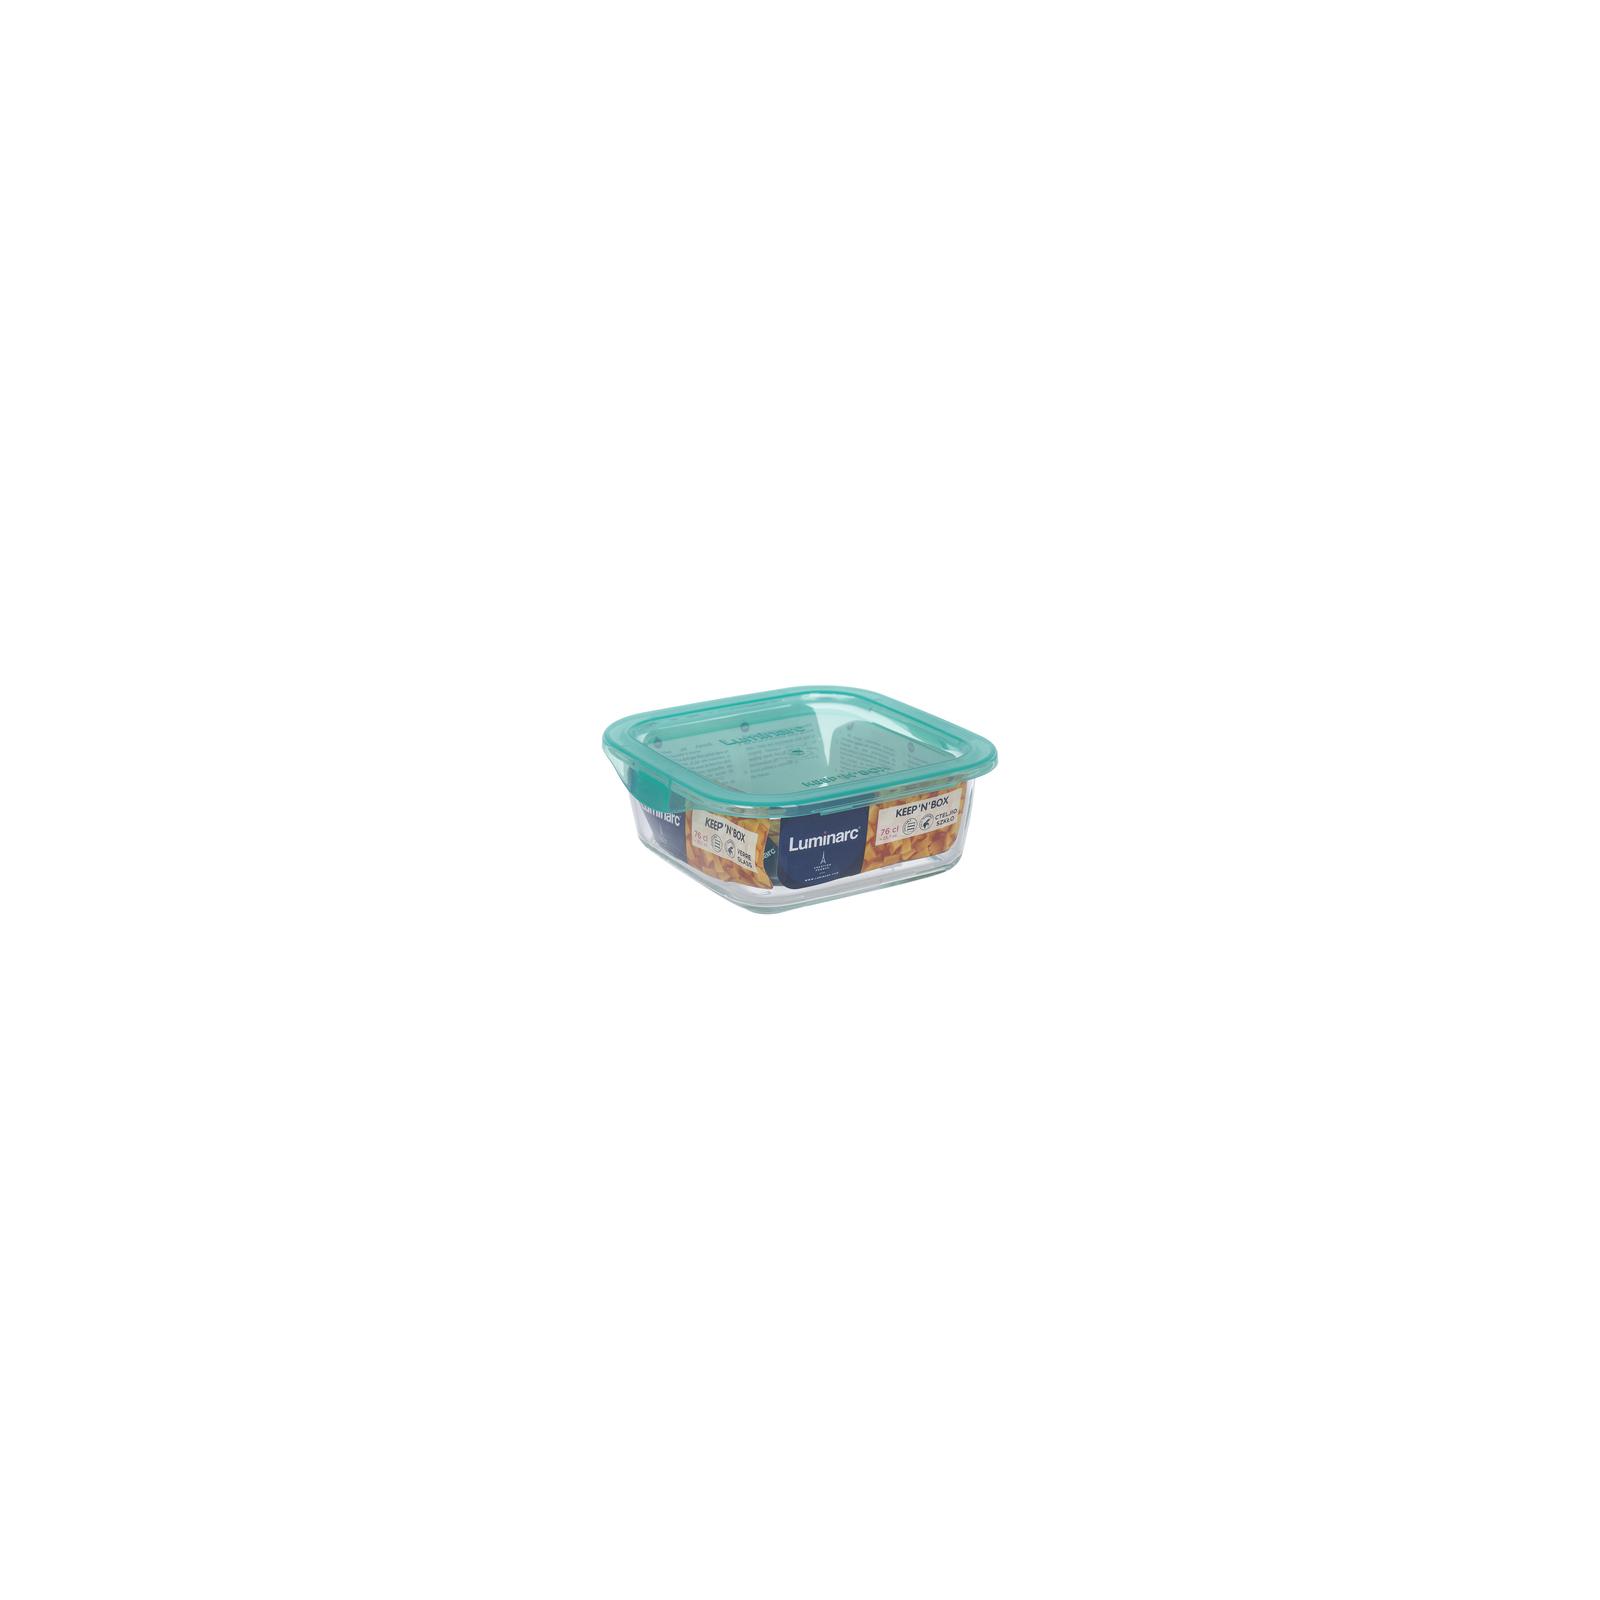 Пищевой контейнер Luminarc Keep'n Box Lagoon квадр. 760 мл (P5521) изображение 3